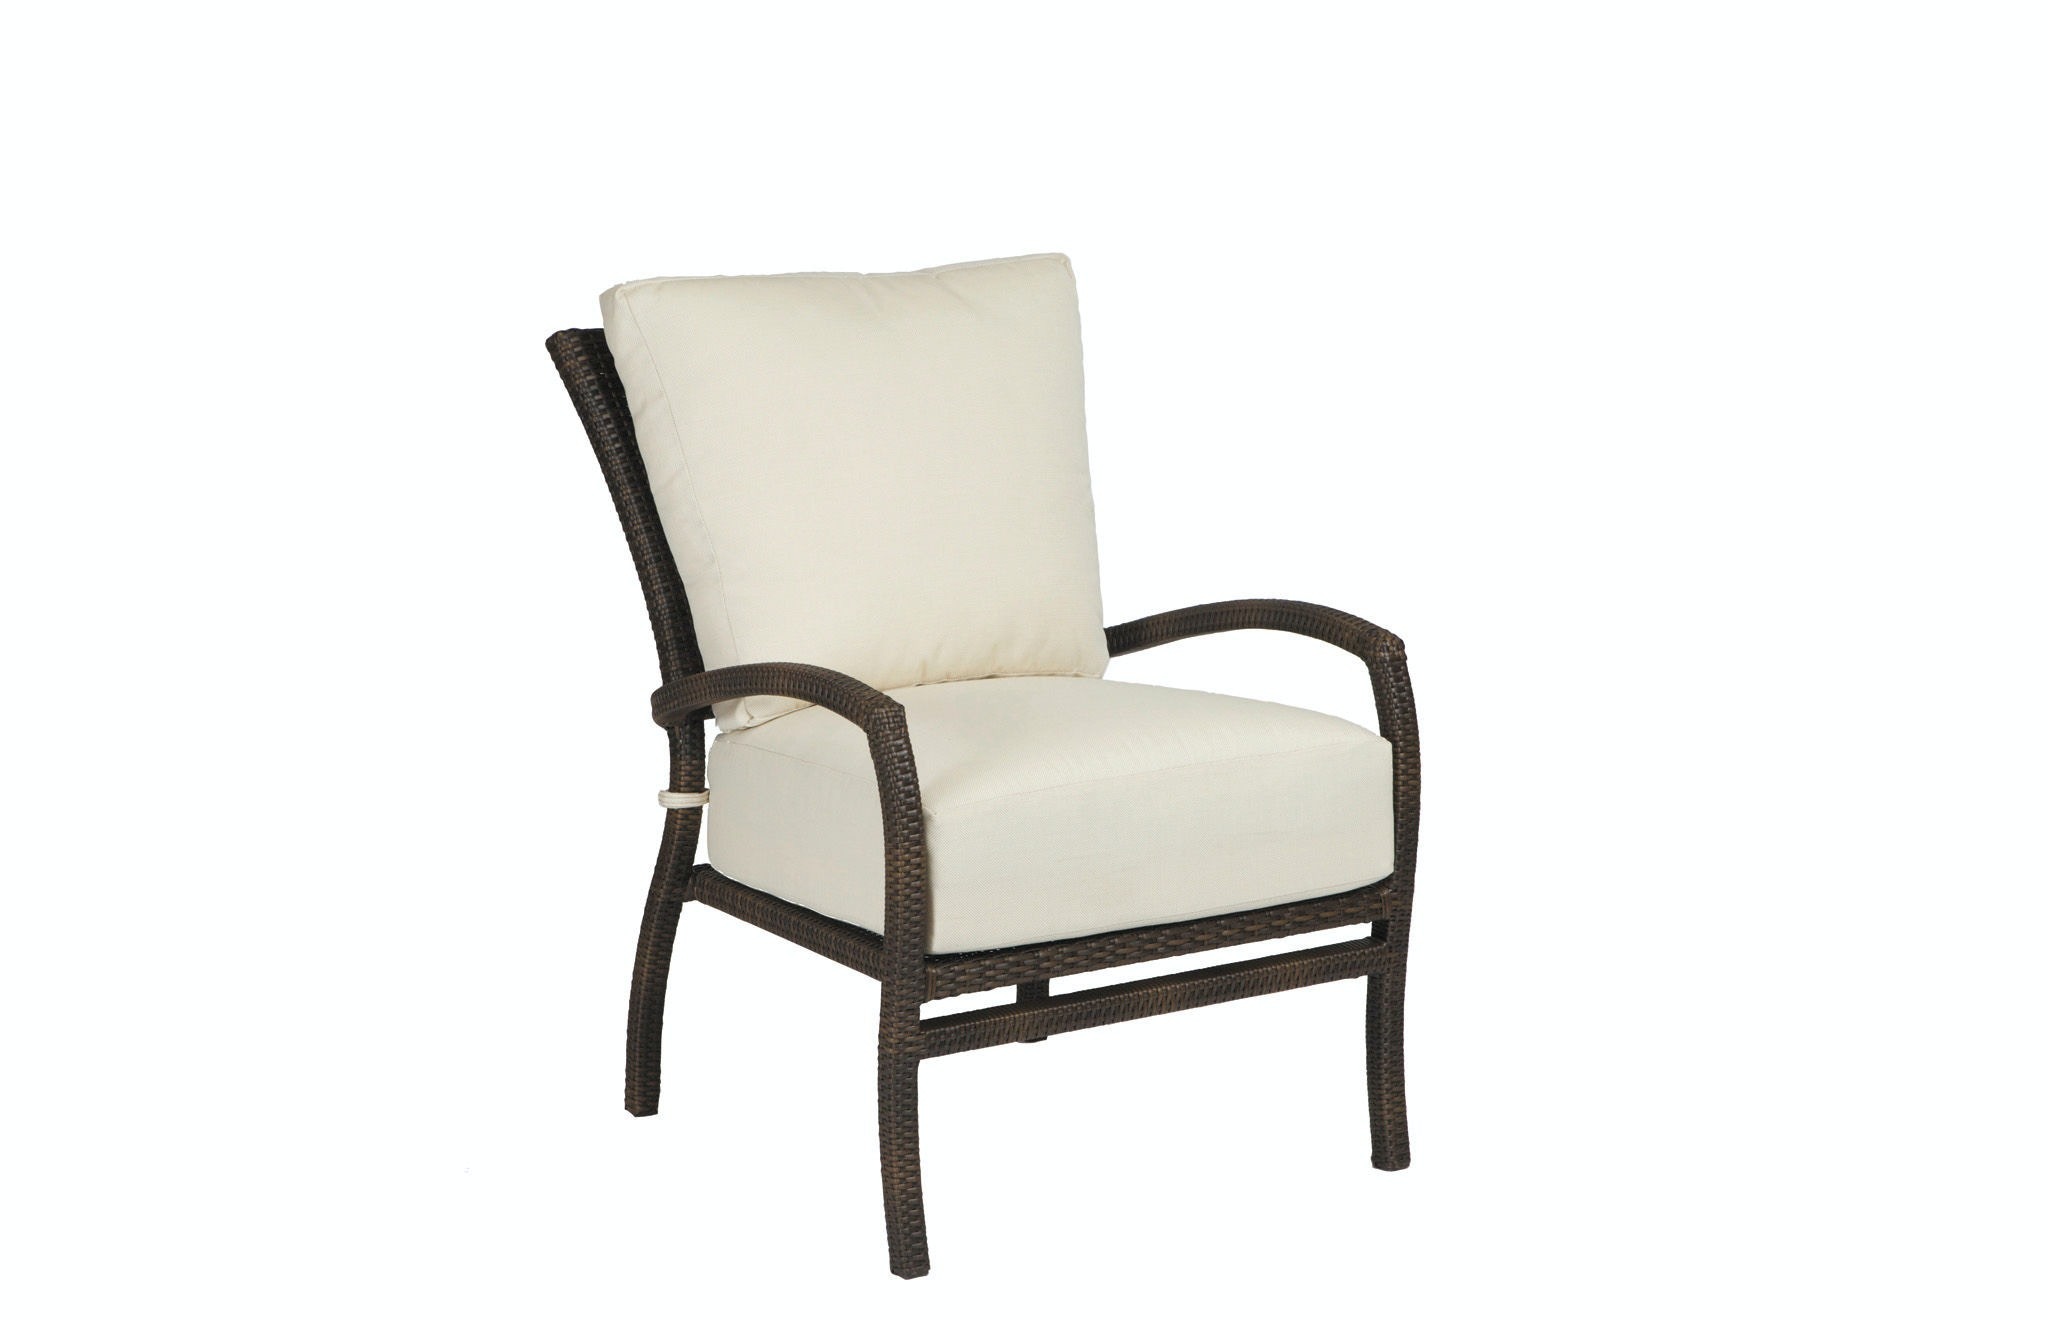 summer chaise lounge chairs graco metropolis high chair classics outdoorpatio skye 35872